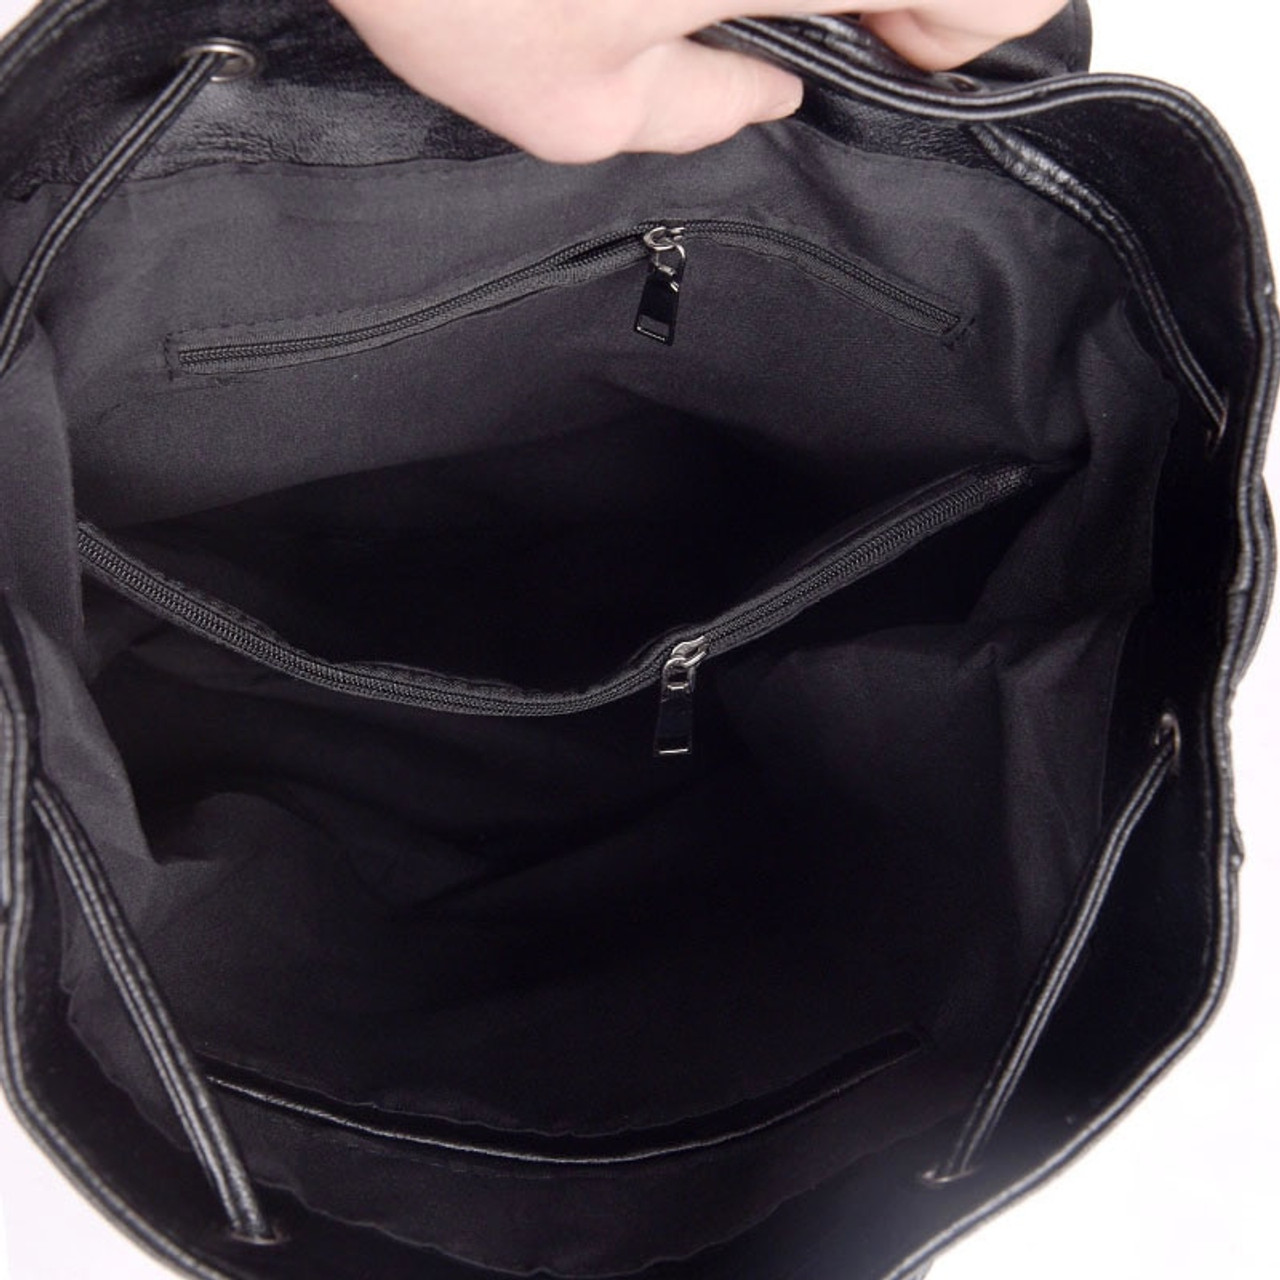 e24bdaa02d9c ... LANYI 2018 New Double zipper Backpack High Quality Leather School Bags  For Teenager Girls Black Women ...